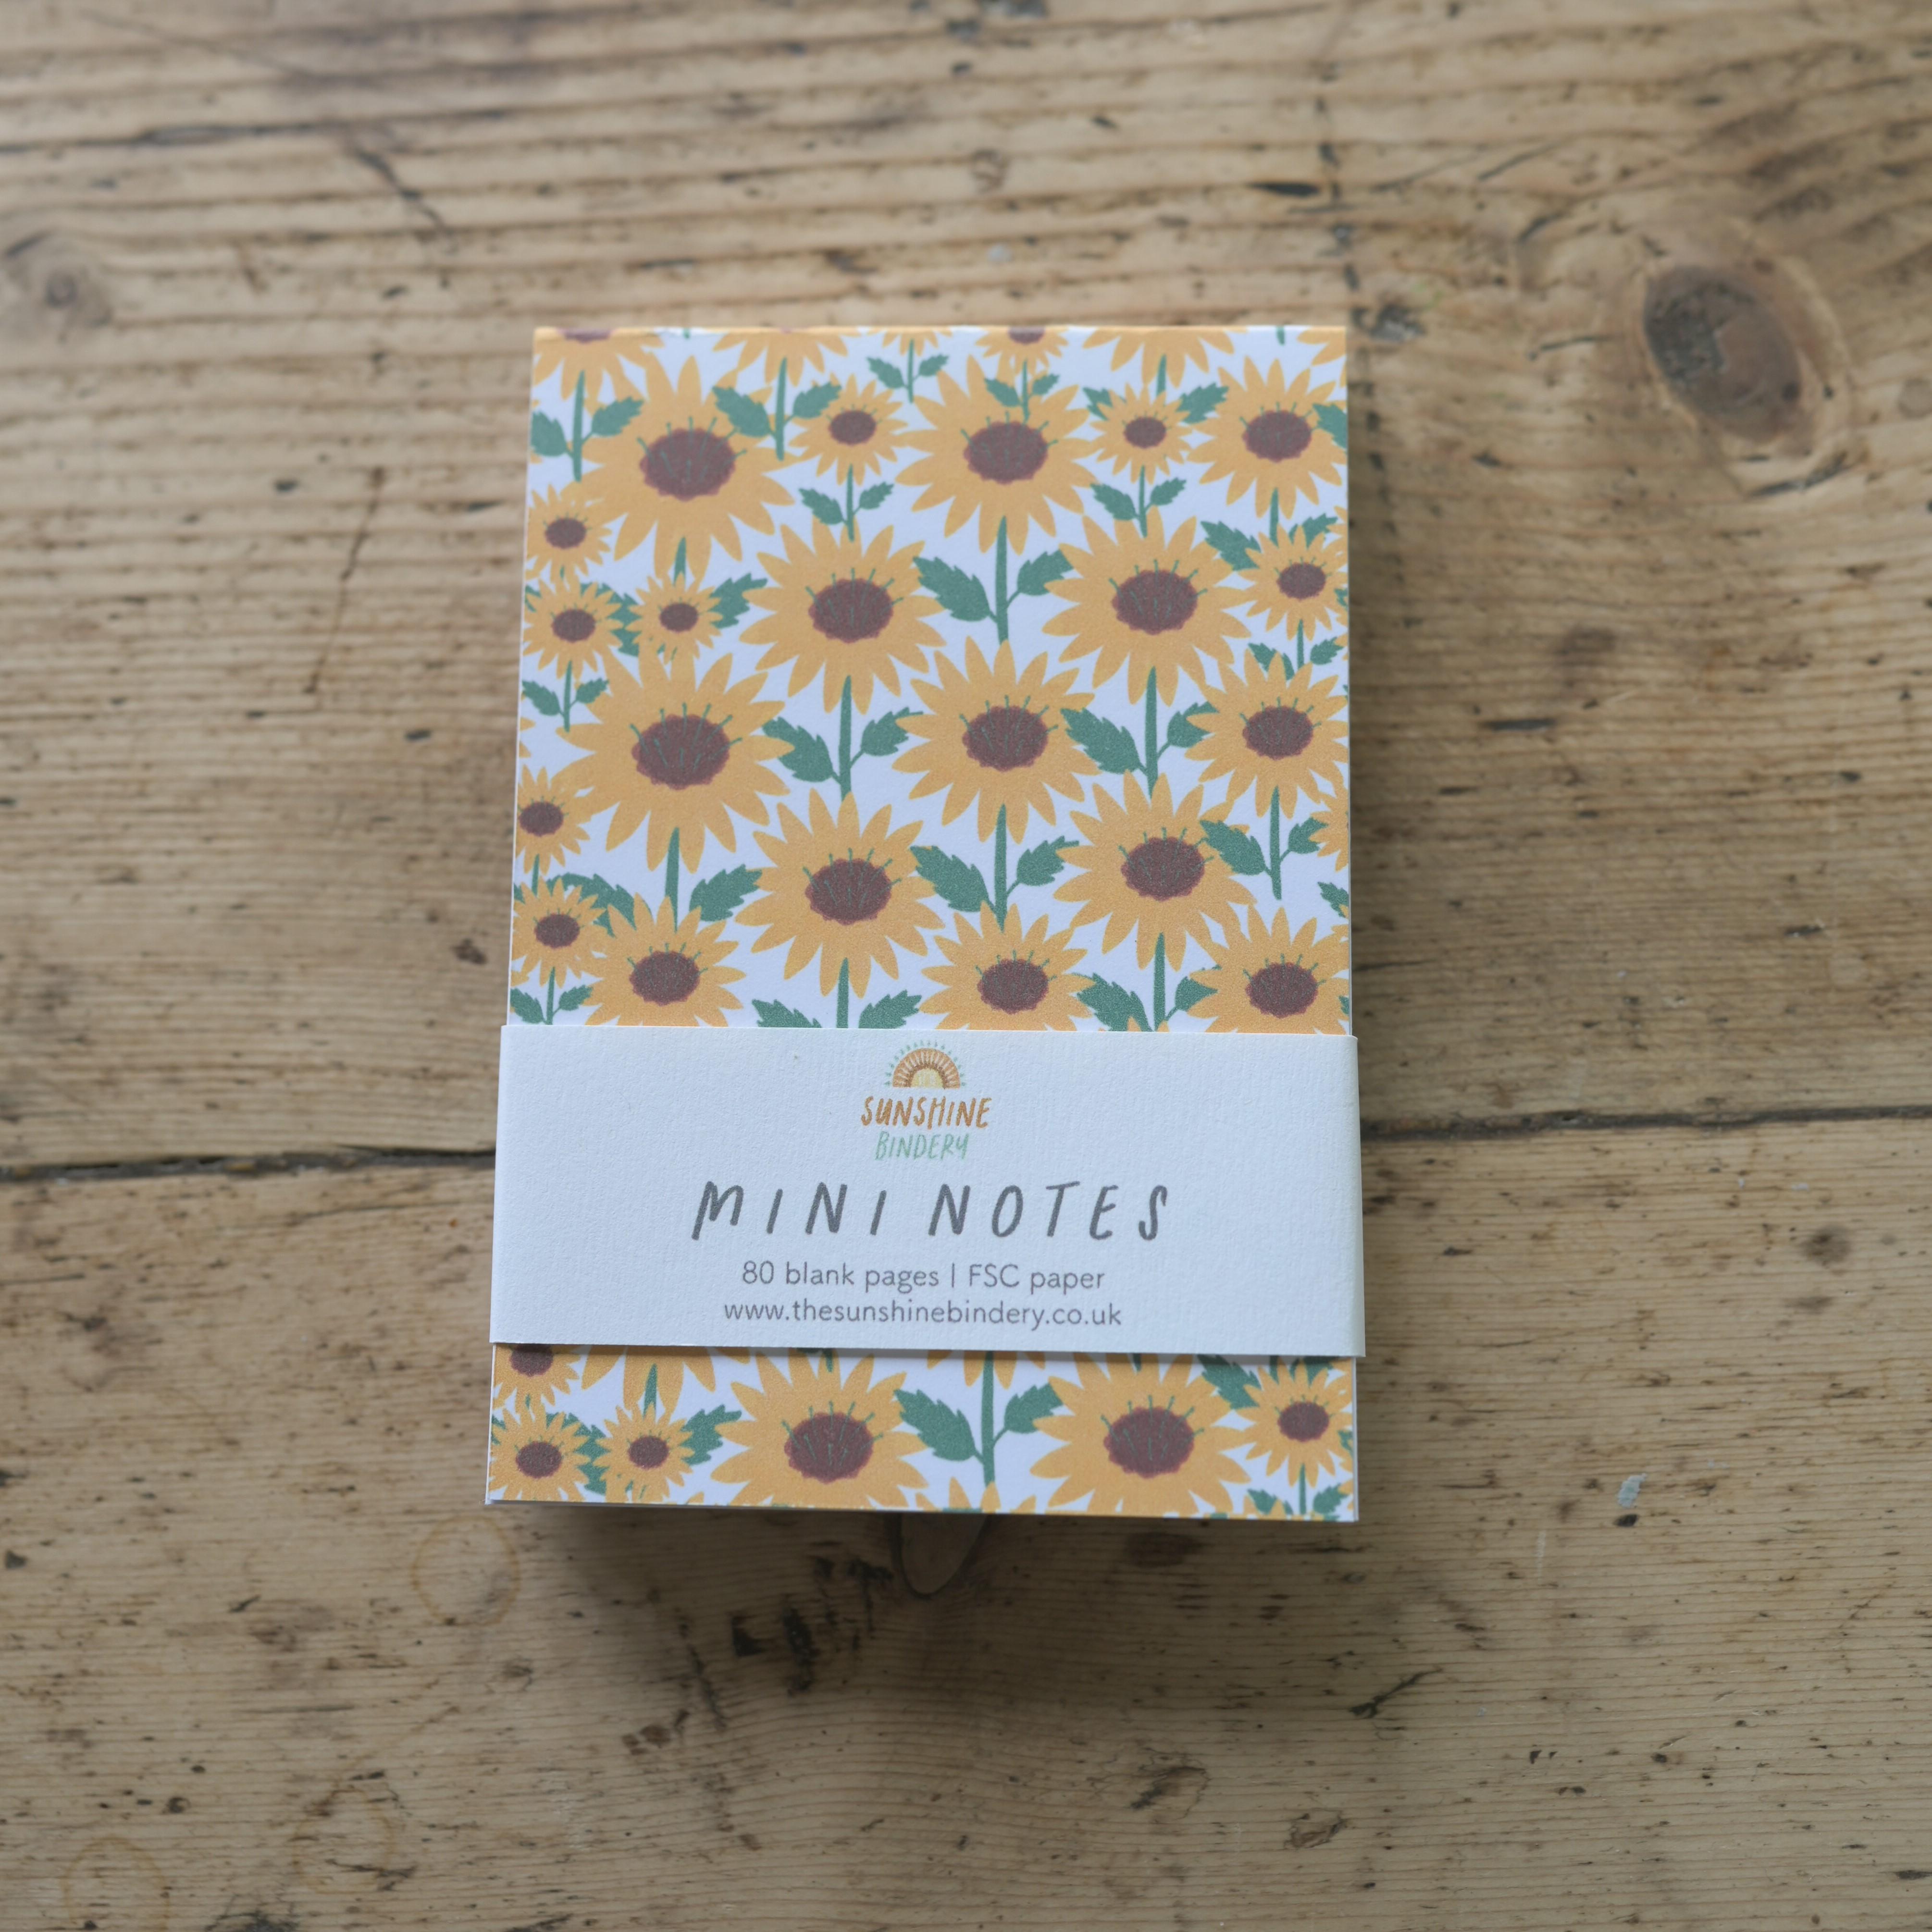 Mini Notes, The Sunshine Bindery